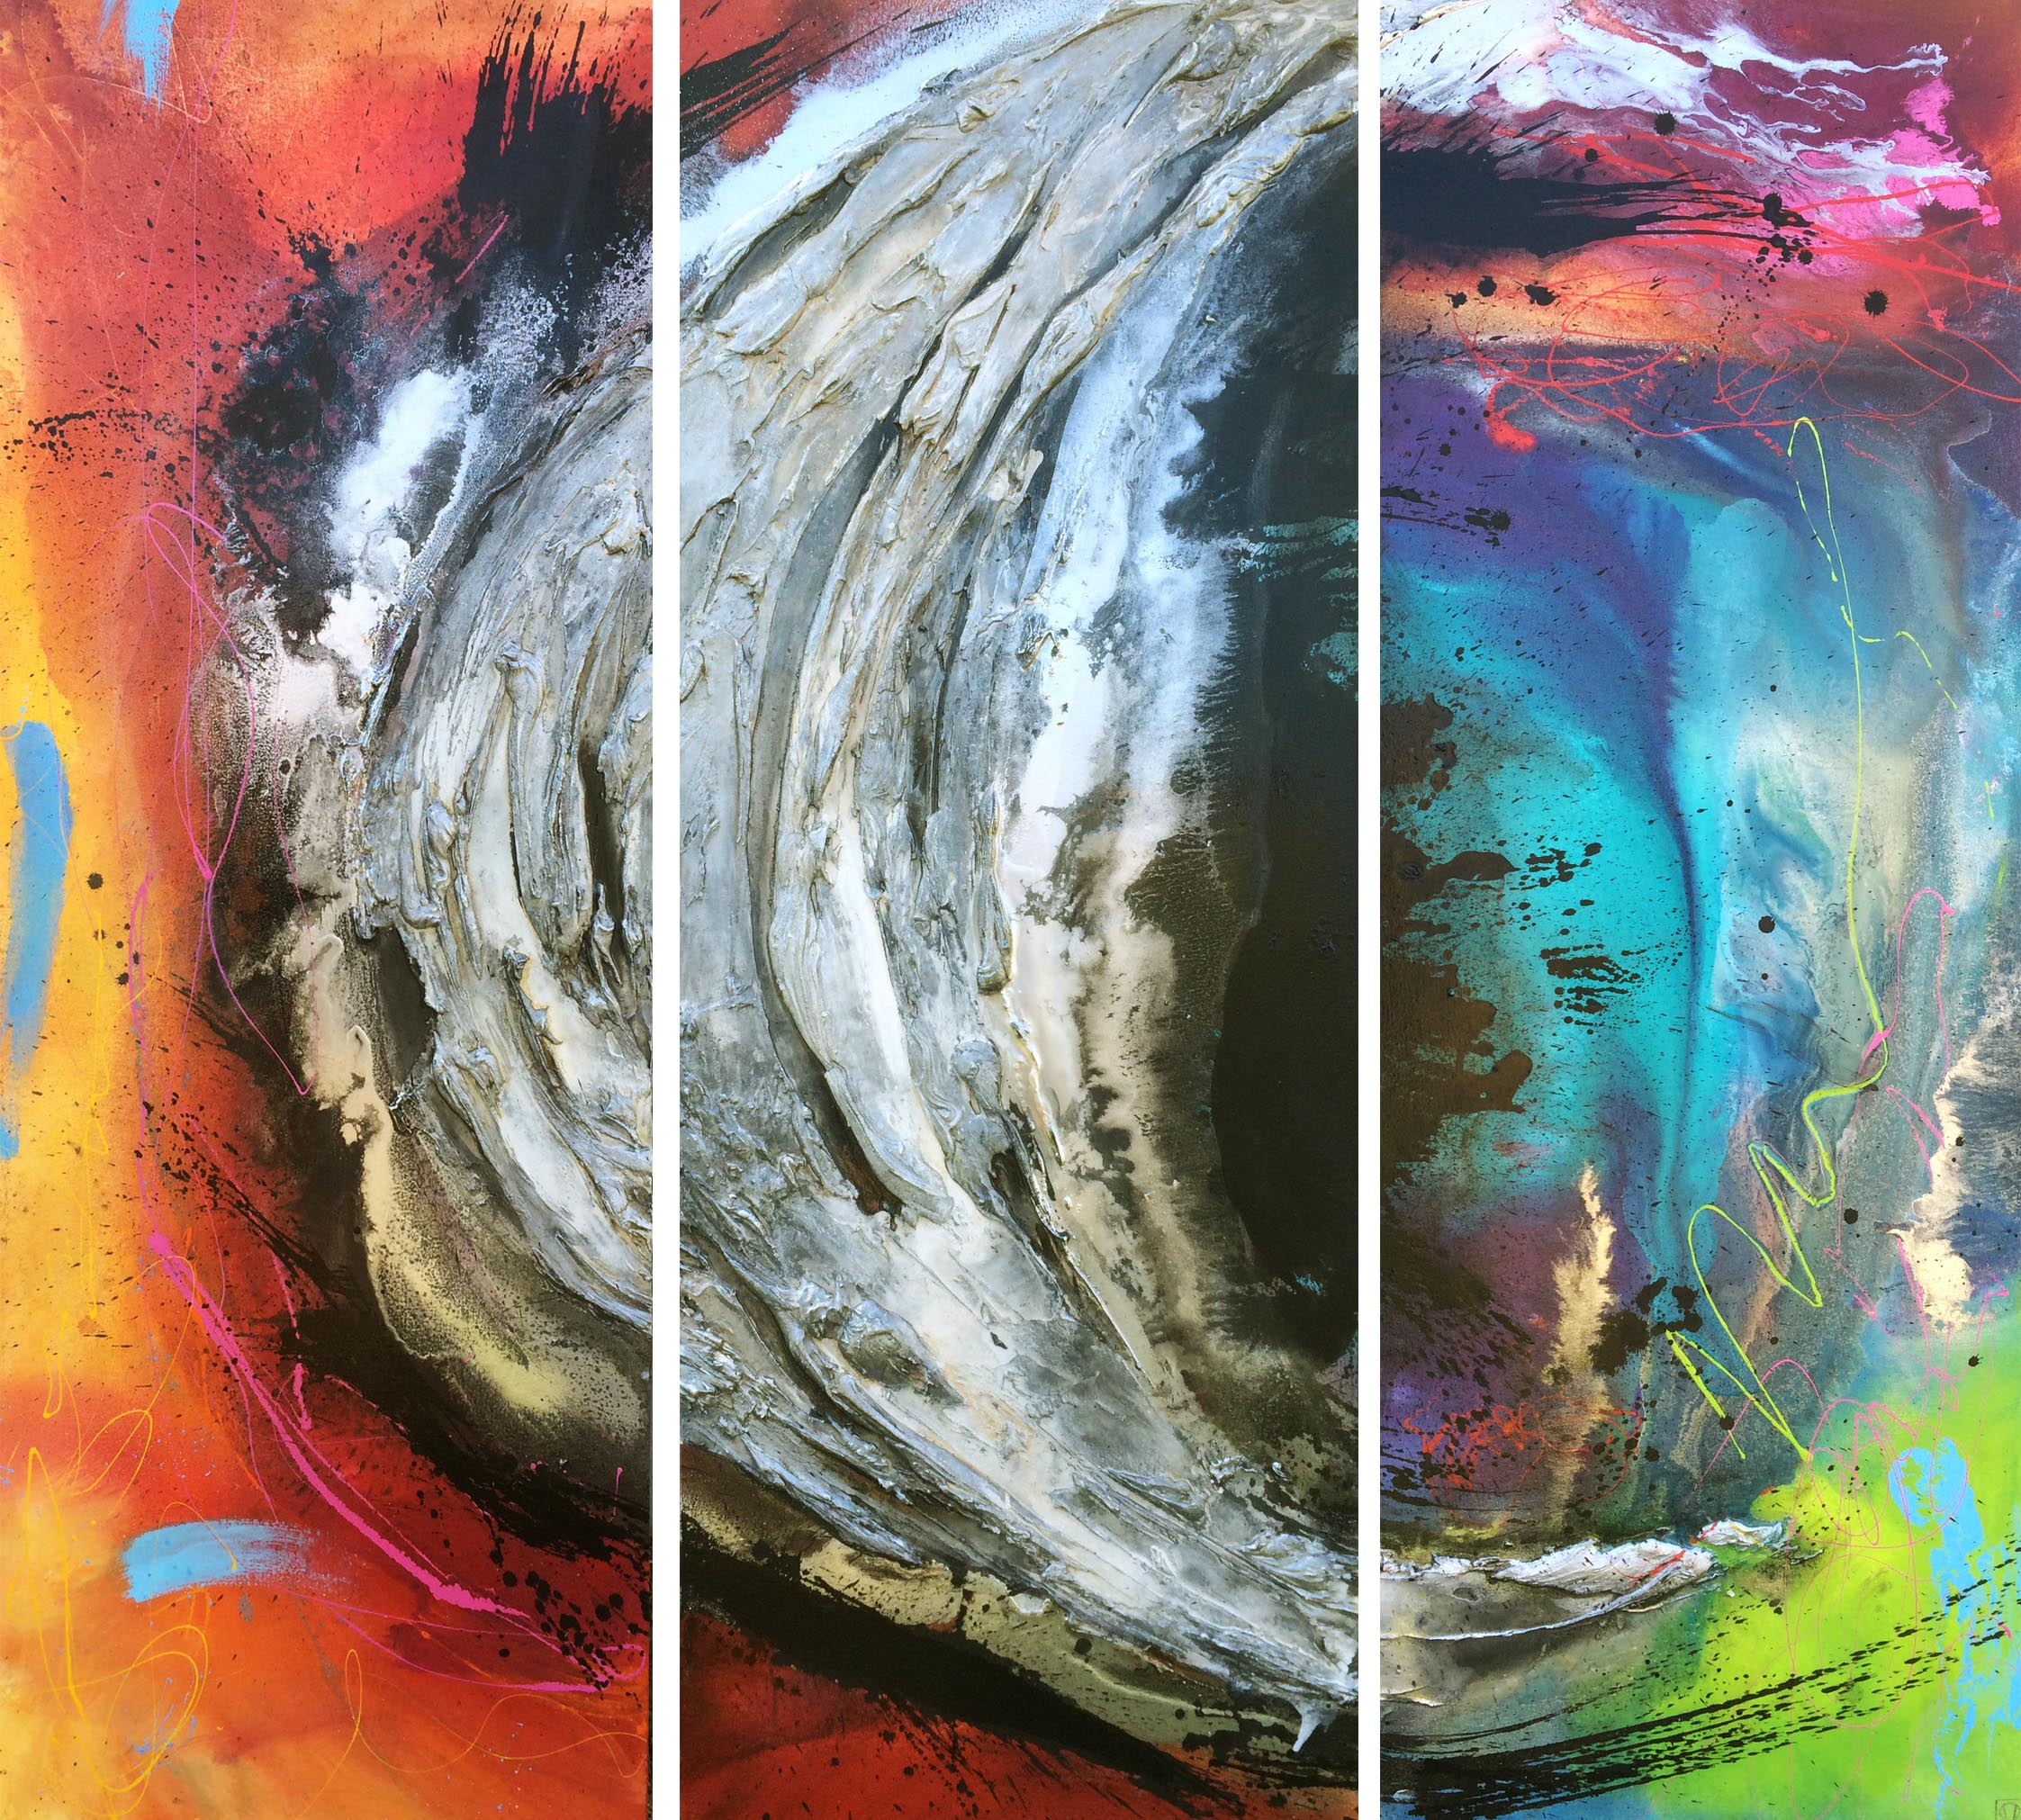 Vicky Sanders Abstract - Pan Galatic